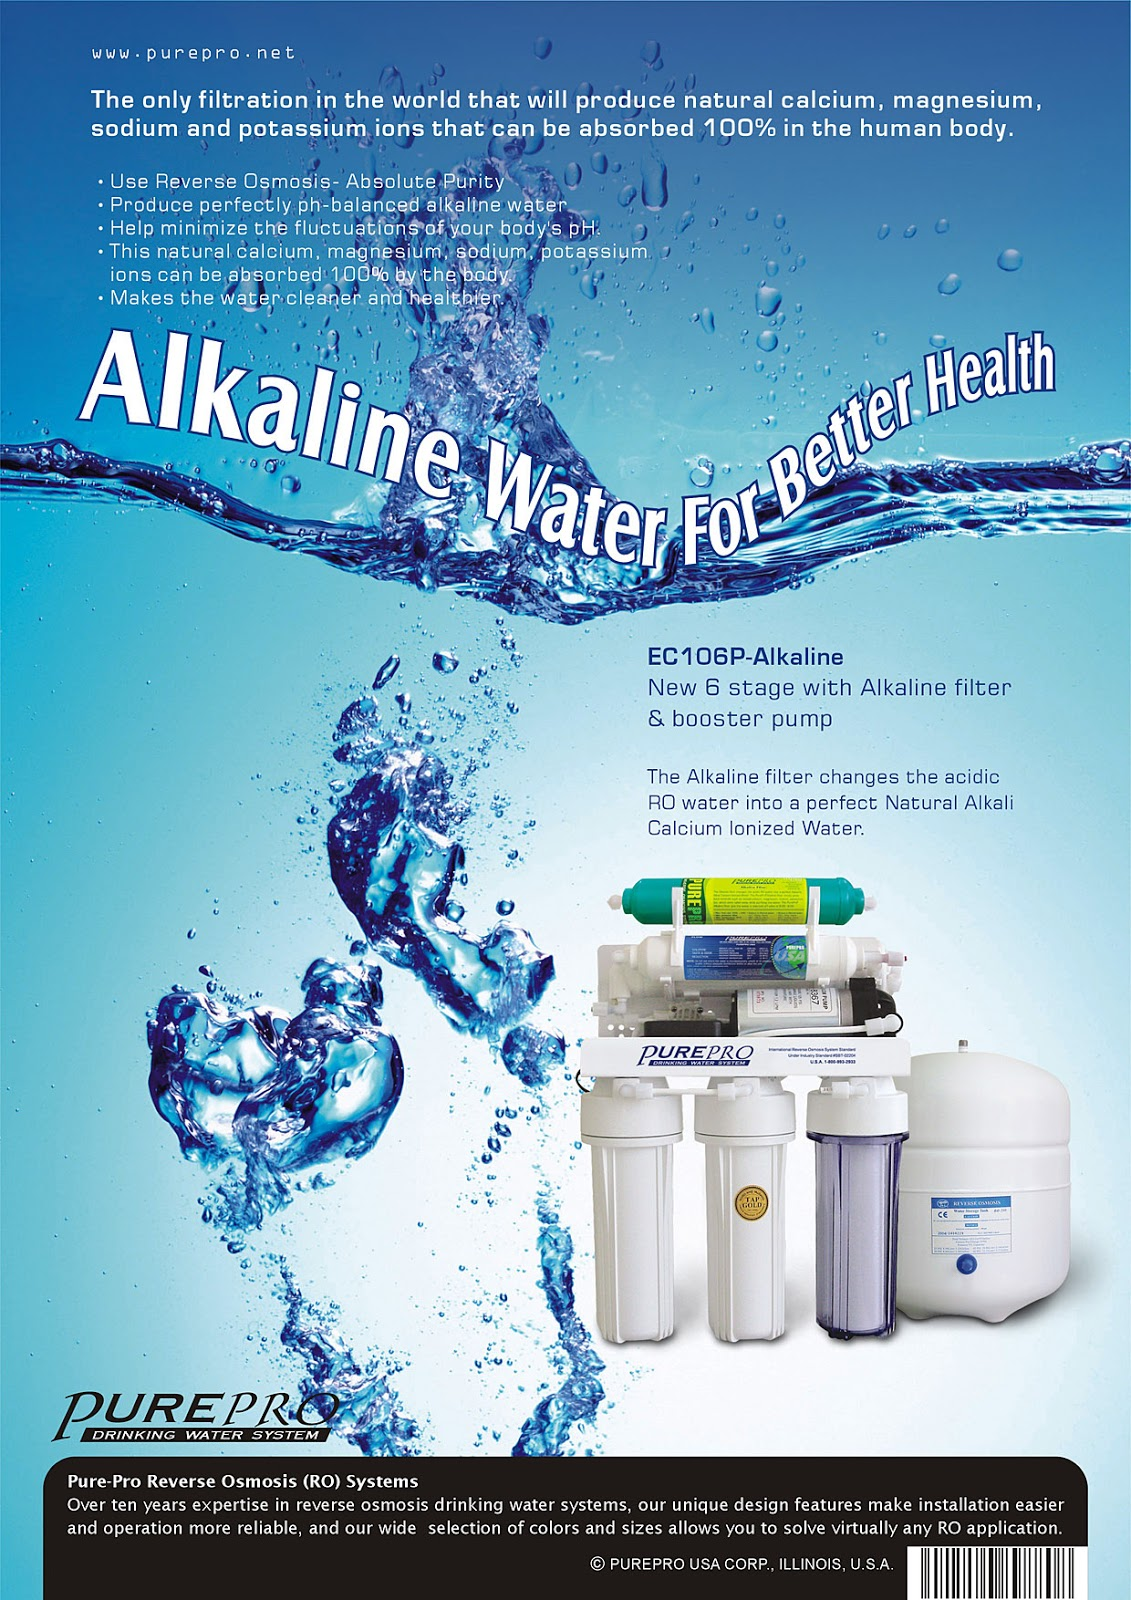 PurePro® EC106P-Alkaline Reverse Osmosis Filter System